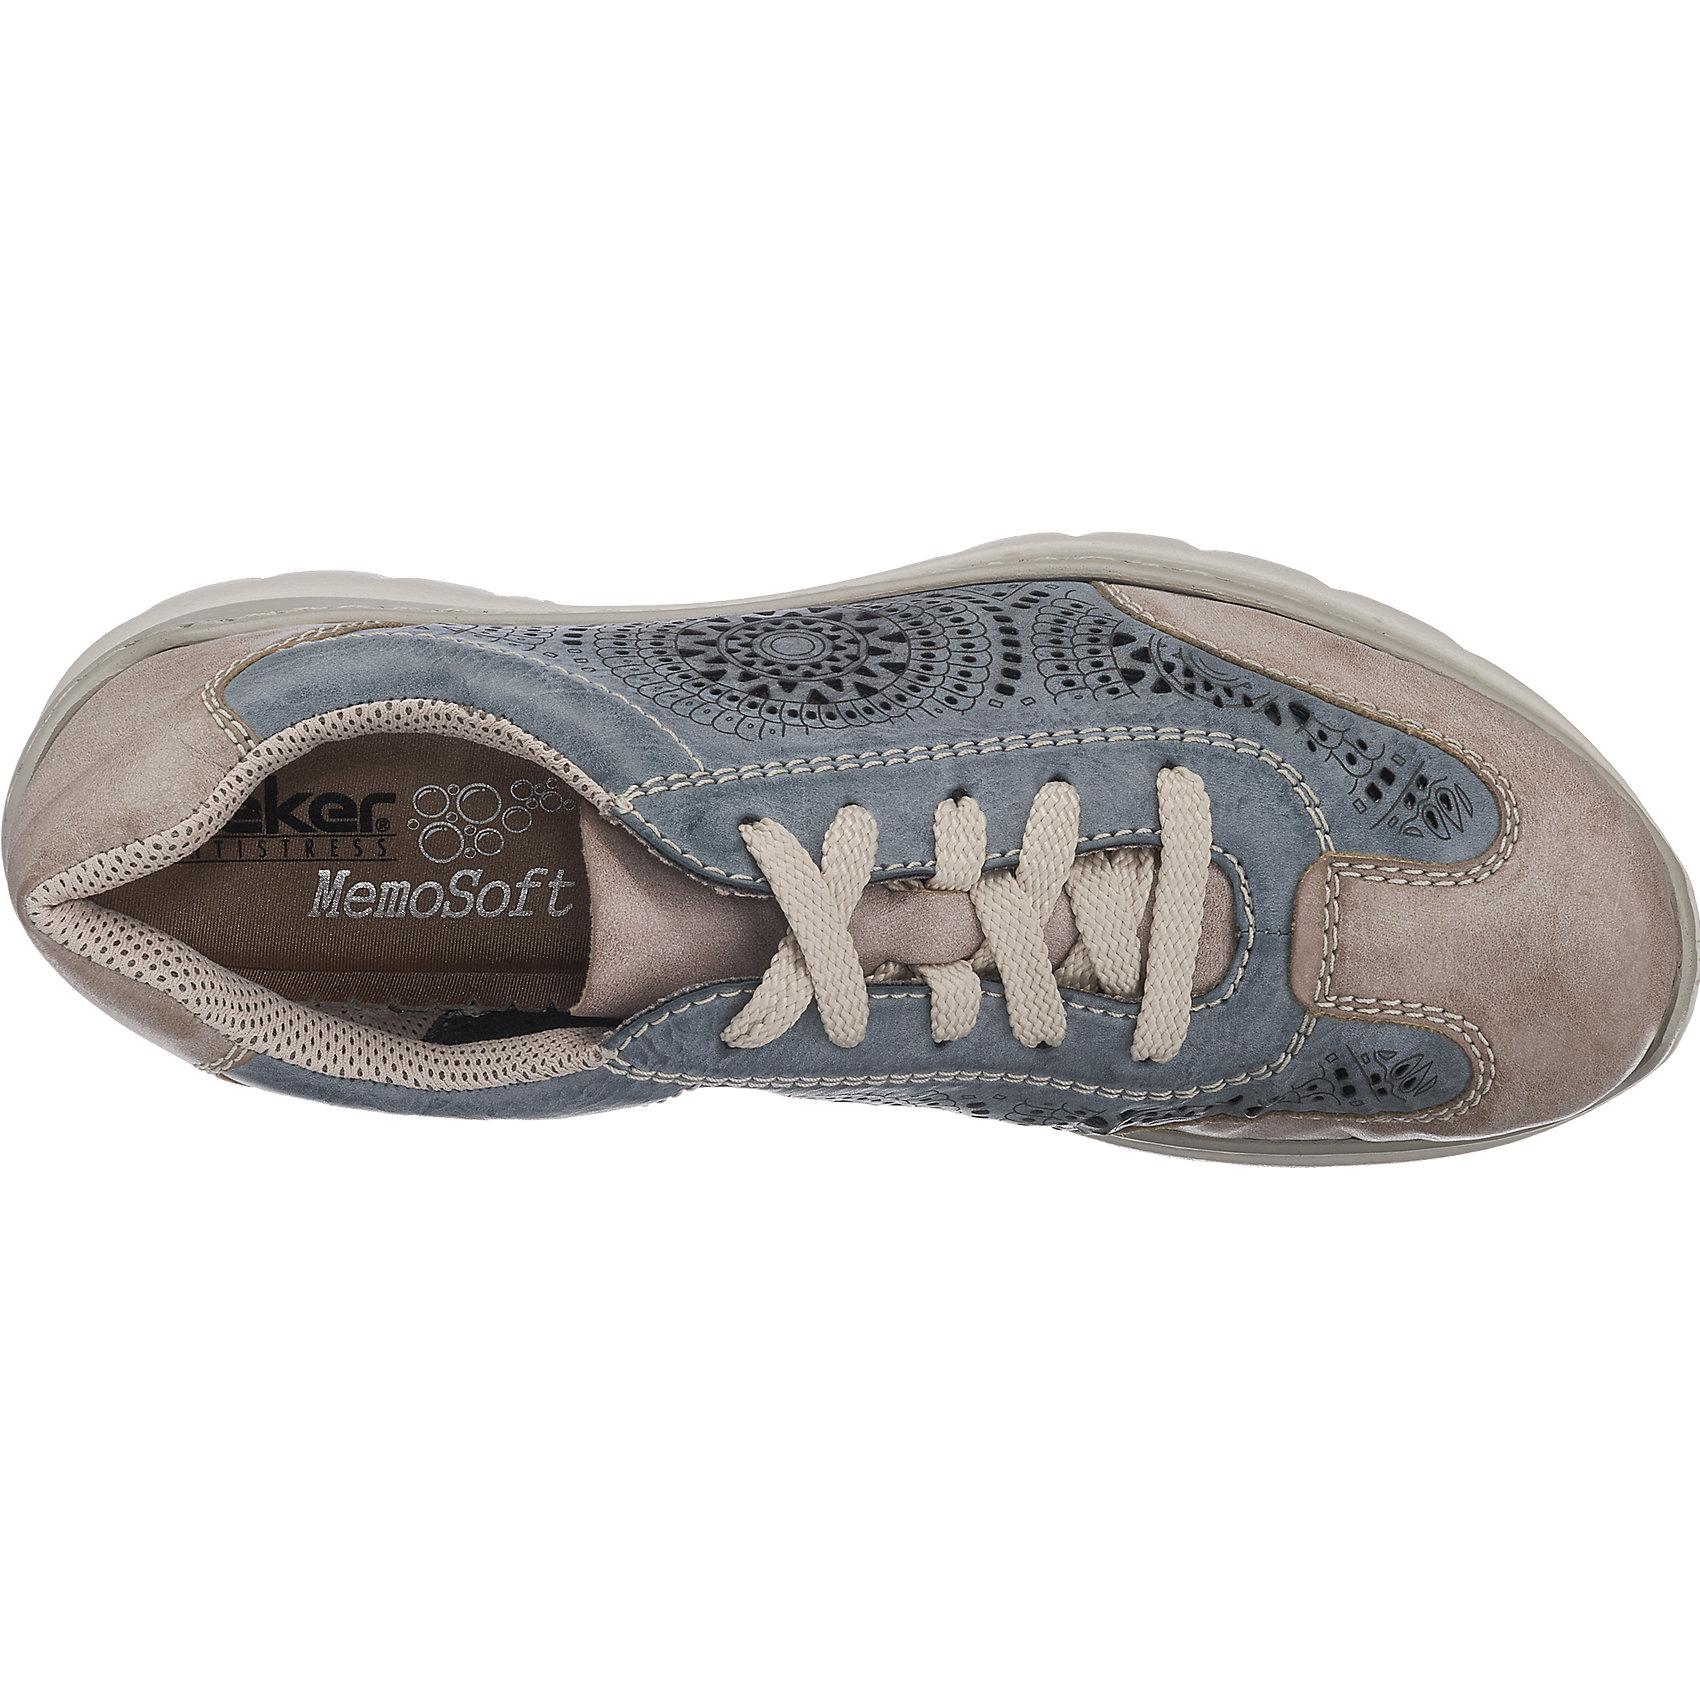 Neu rieker Sneakers Sneakers rieker blau-kombi 5769673 258c75